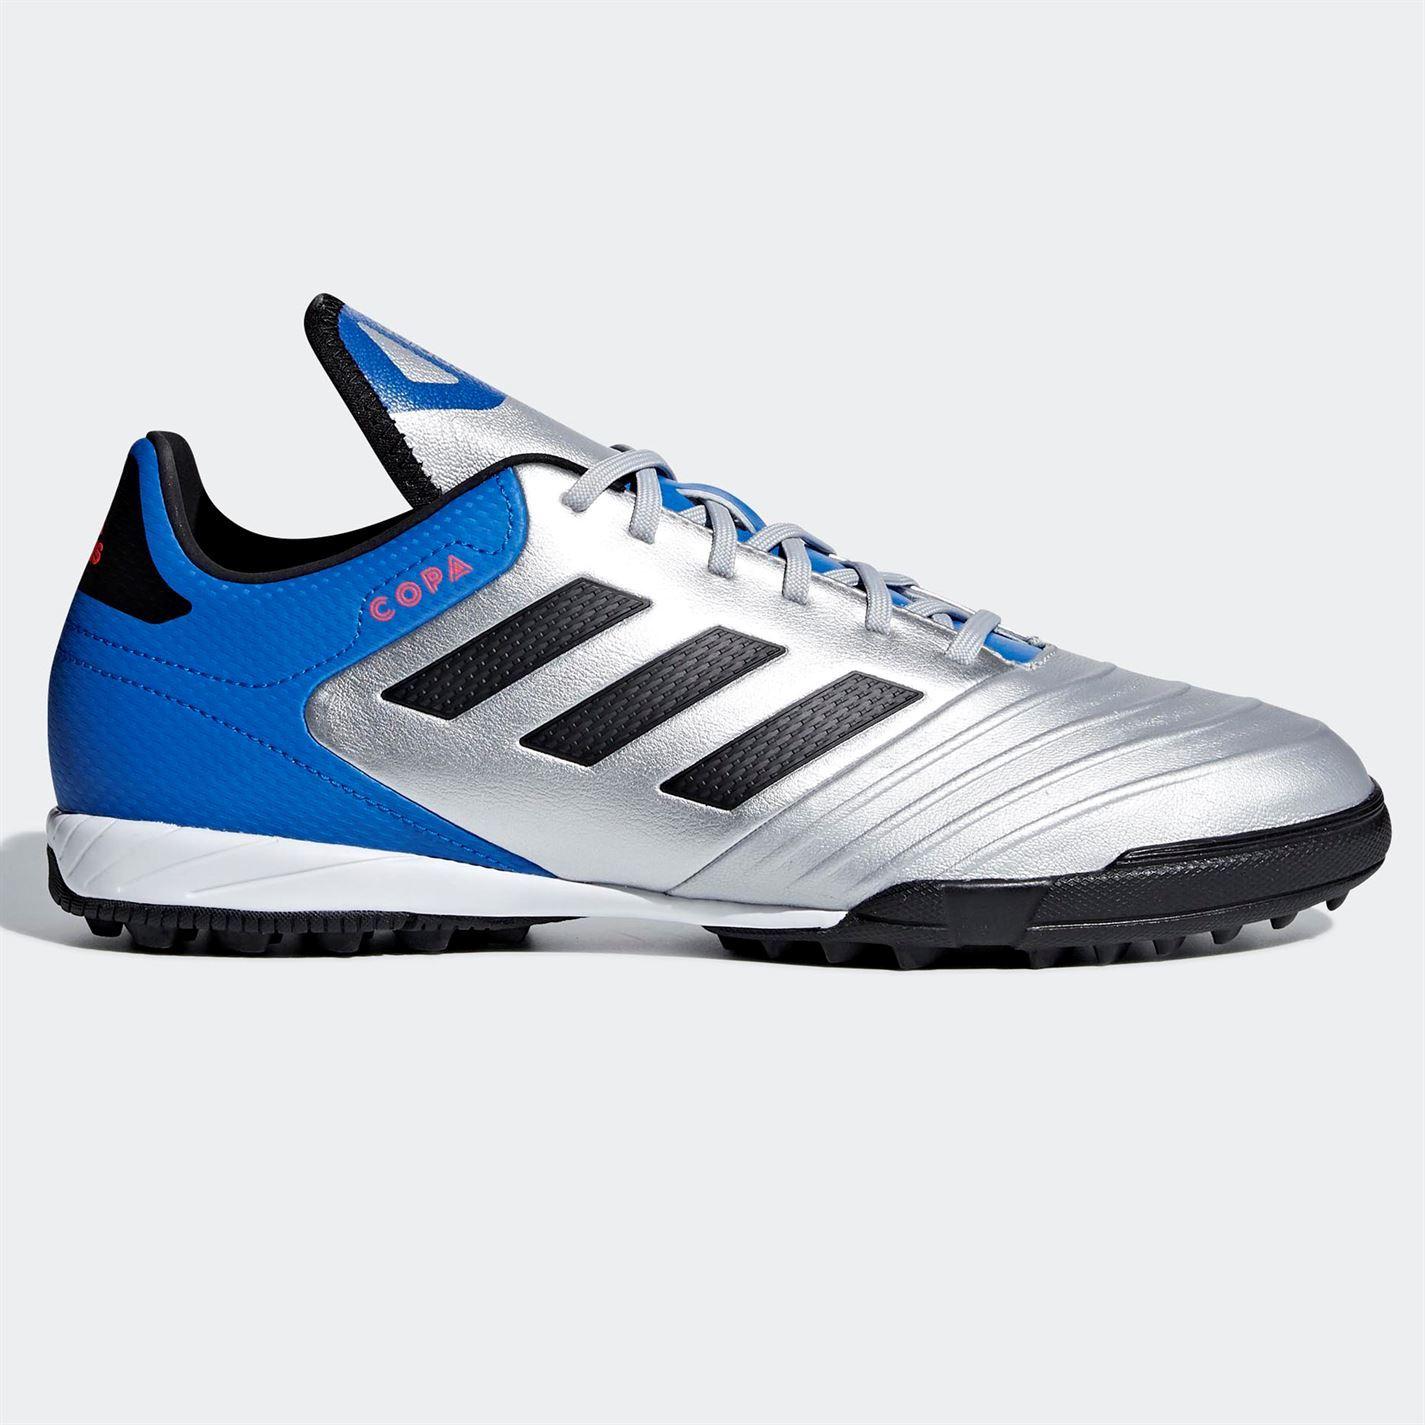 f1e312b0c11 ... adidas Copa Tango 18.3 Astro Turf Football Trainers Mens Silver Soccer  Shoes ...